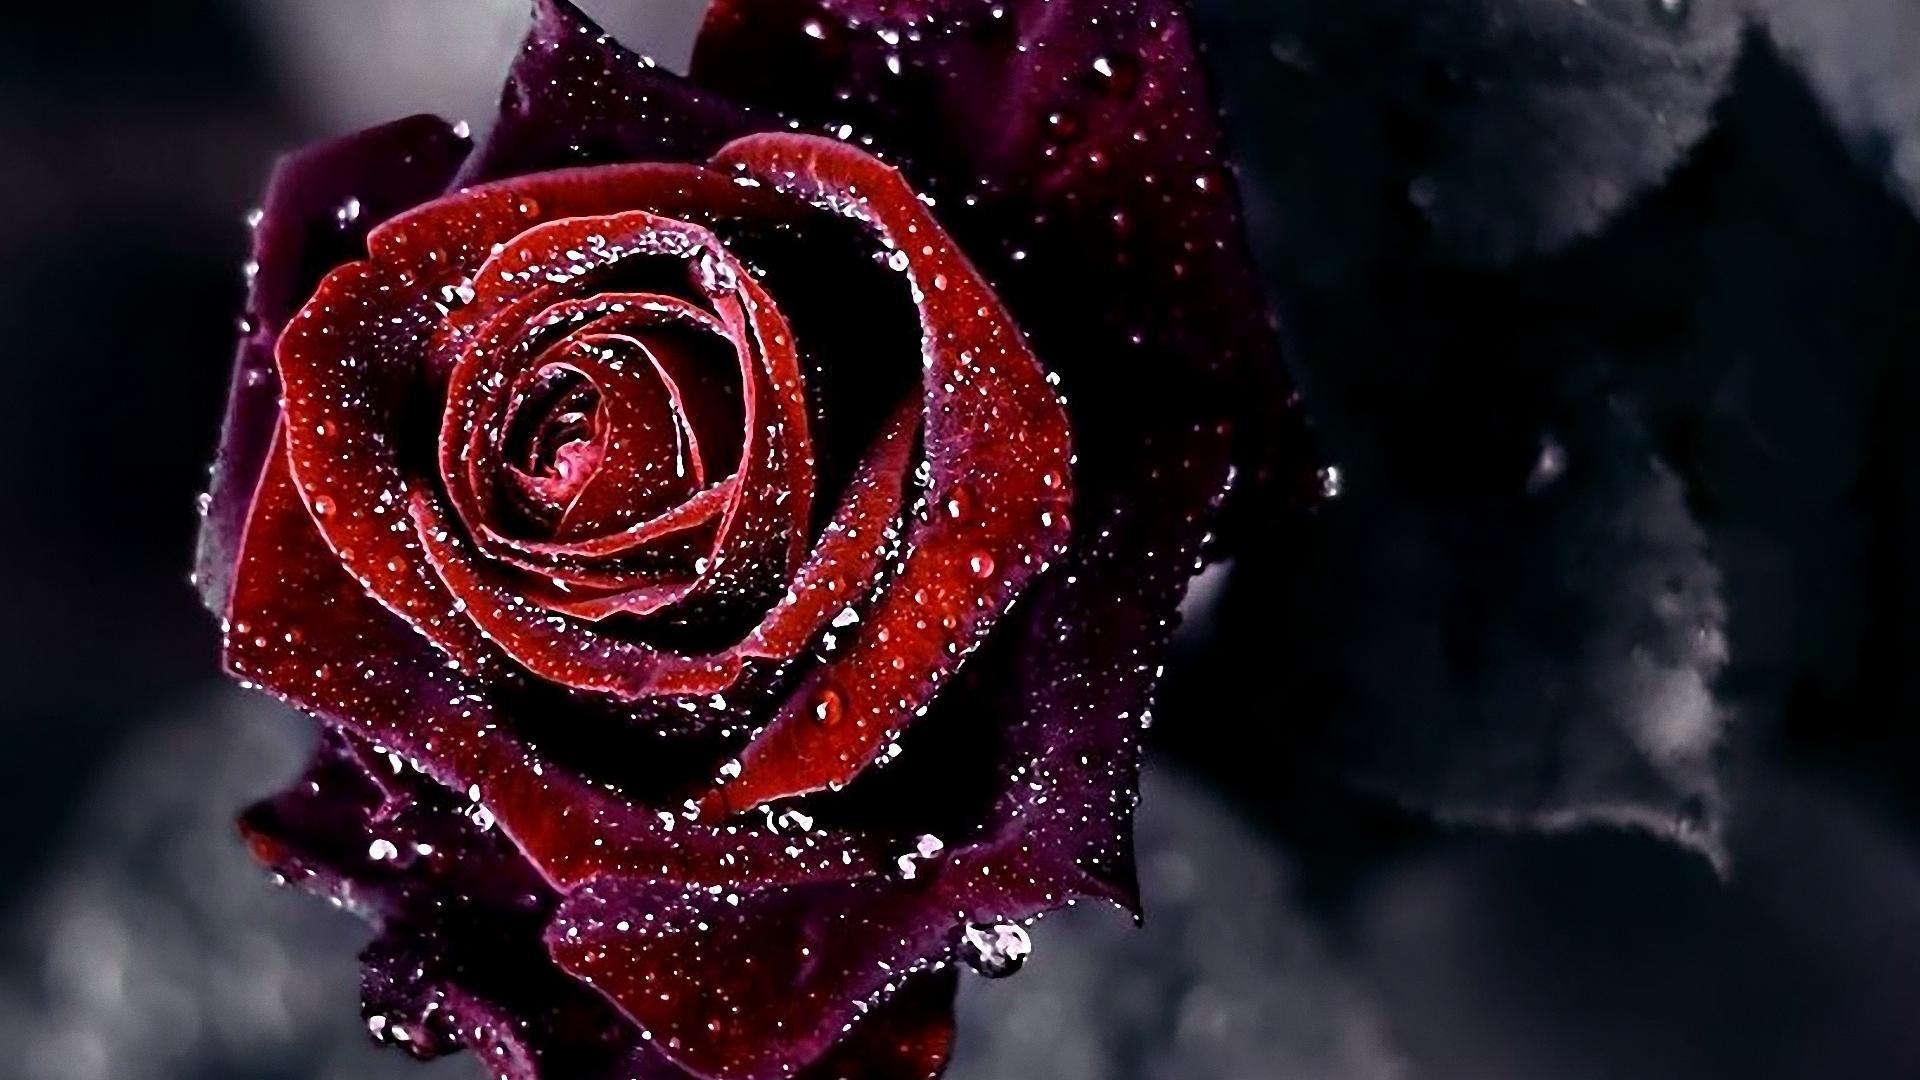 Red Rose Flower Background HD Wallpaper of Flower   hdwallpaper2013 1920x1080